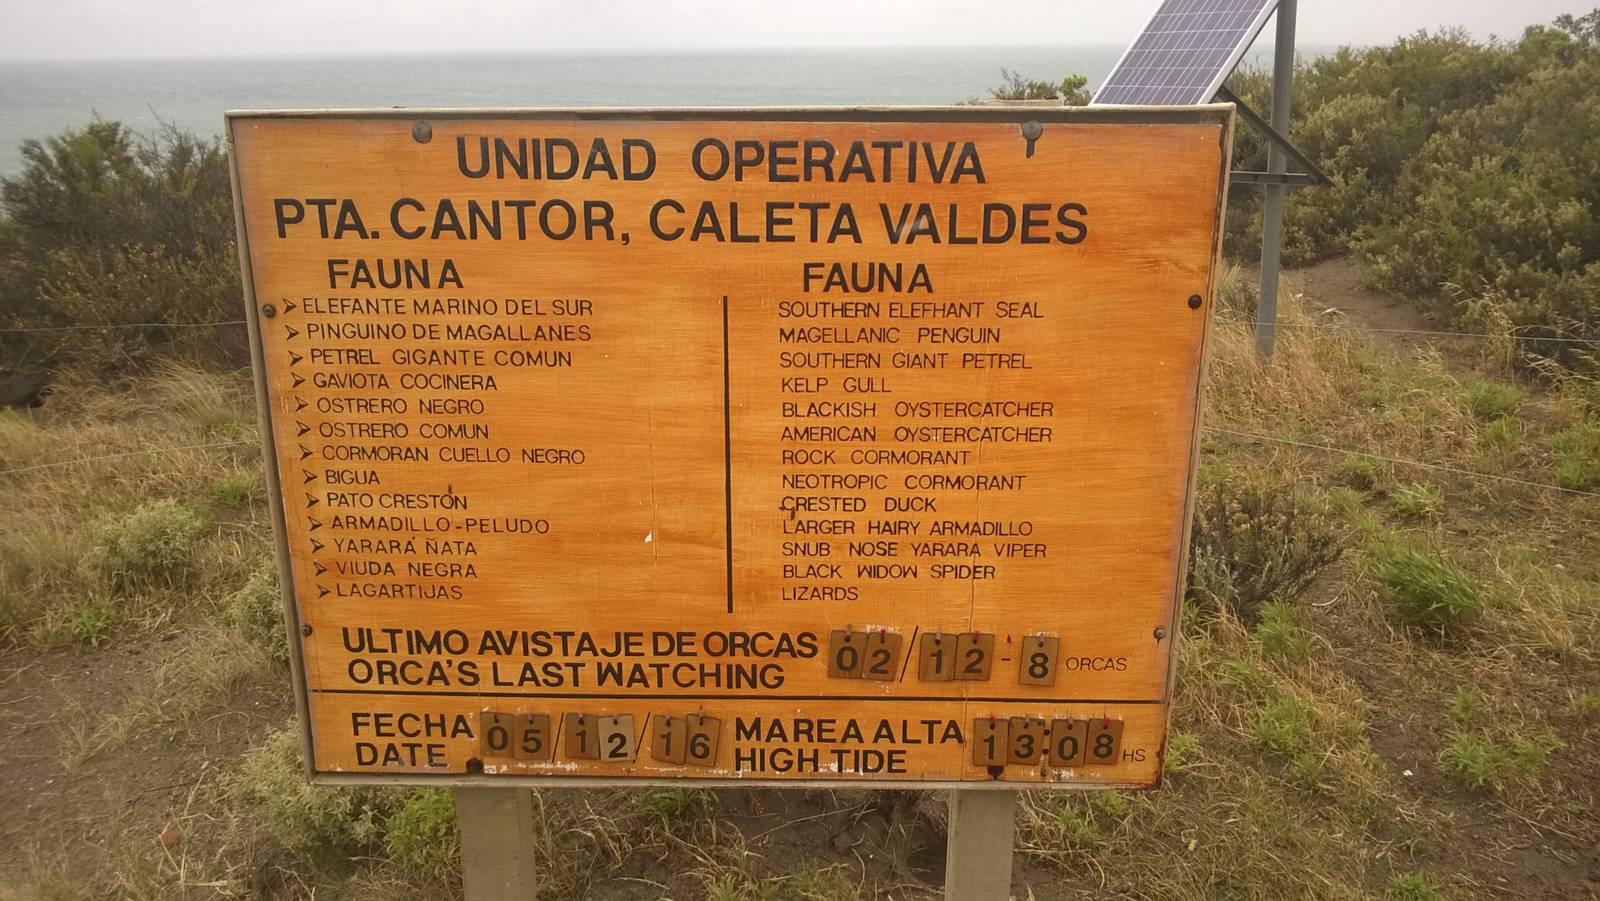 Argentina-Peninsula-de-Valdes-Orca-Marea-Alta